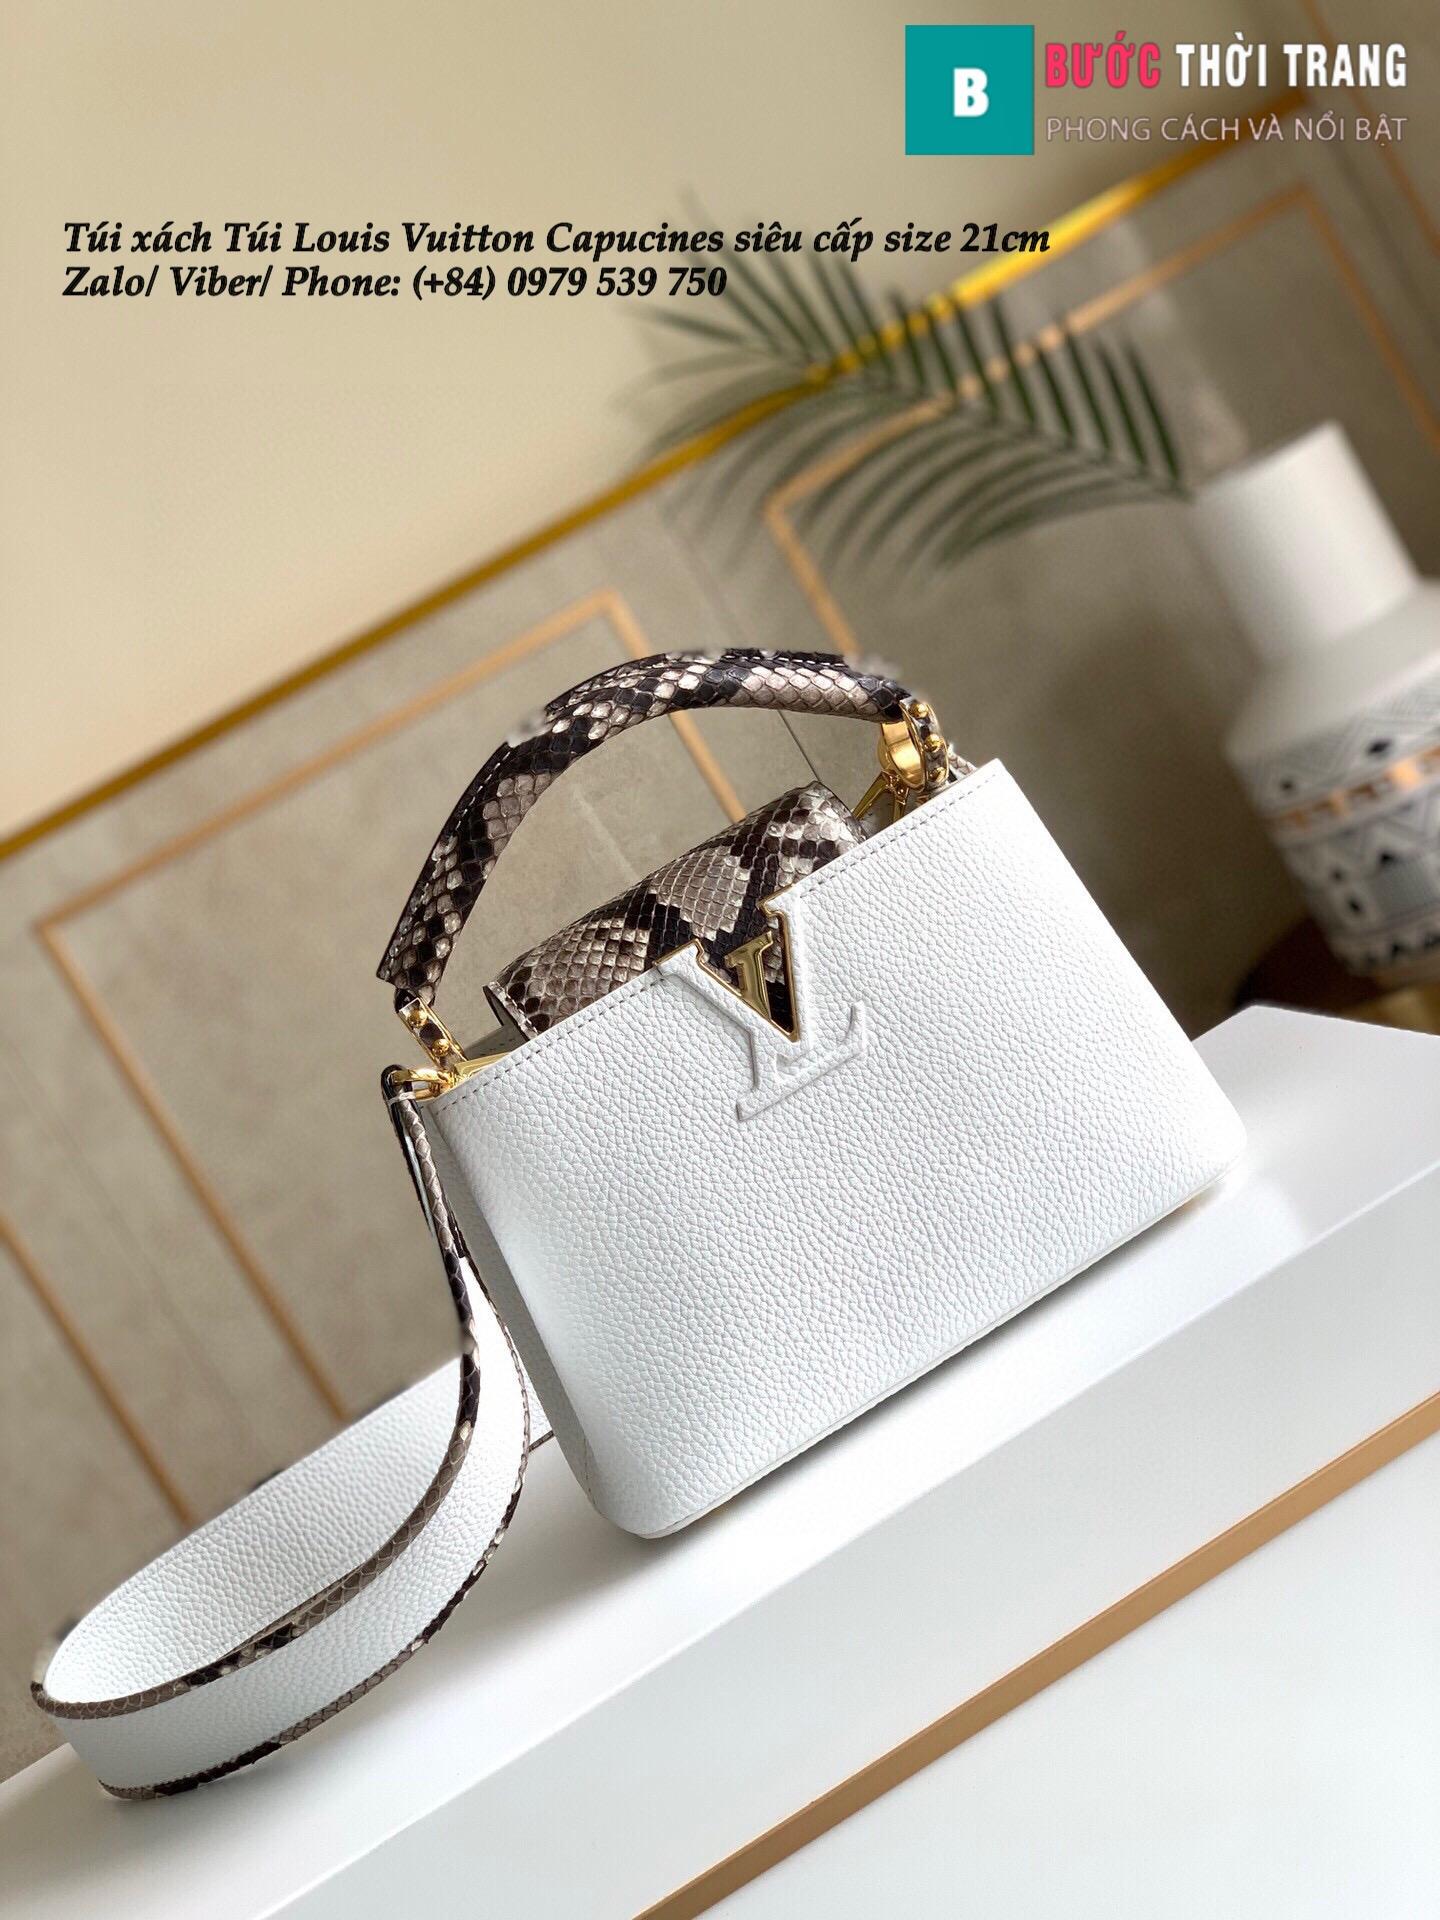 Túi Louis Vuitton Capucines siêu cấp quai da trăn size 21cm – M95509 (28)